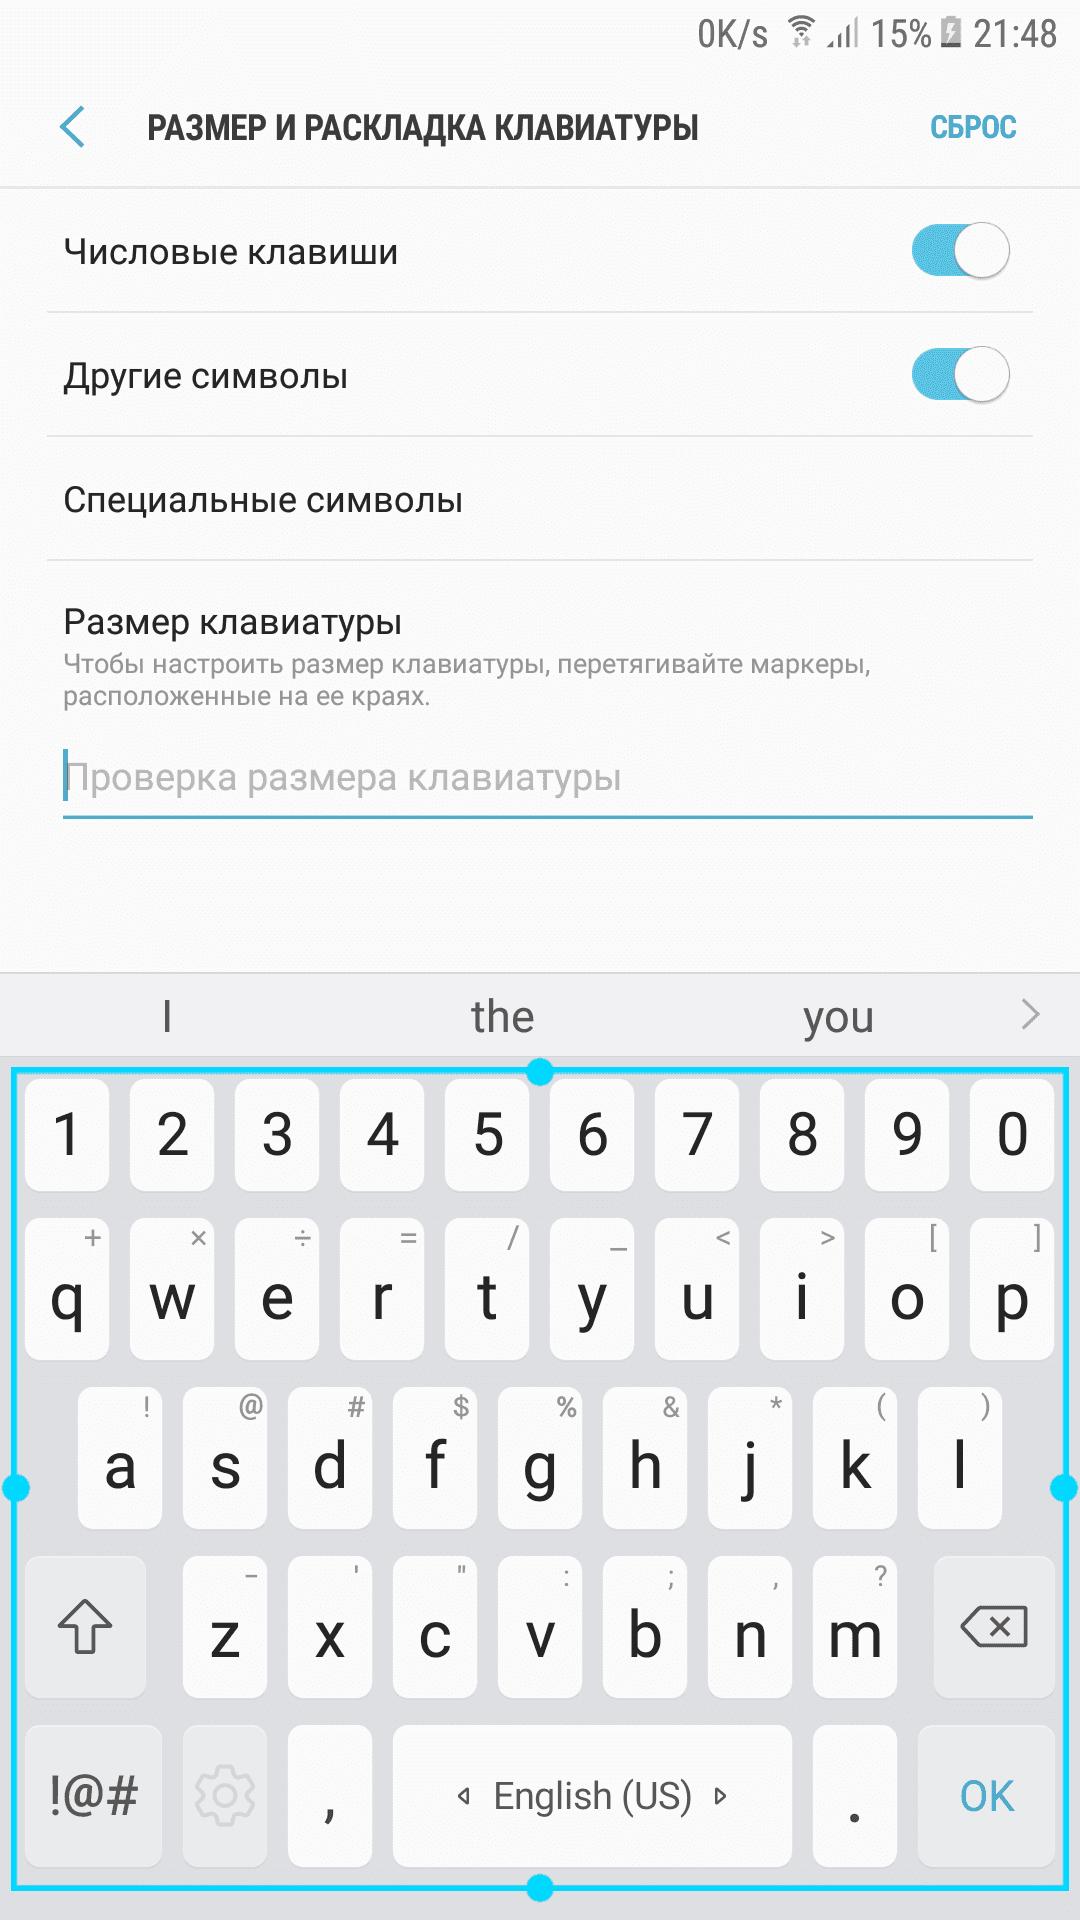 Galaxy A5 2016 Nougat screenshot KK 1